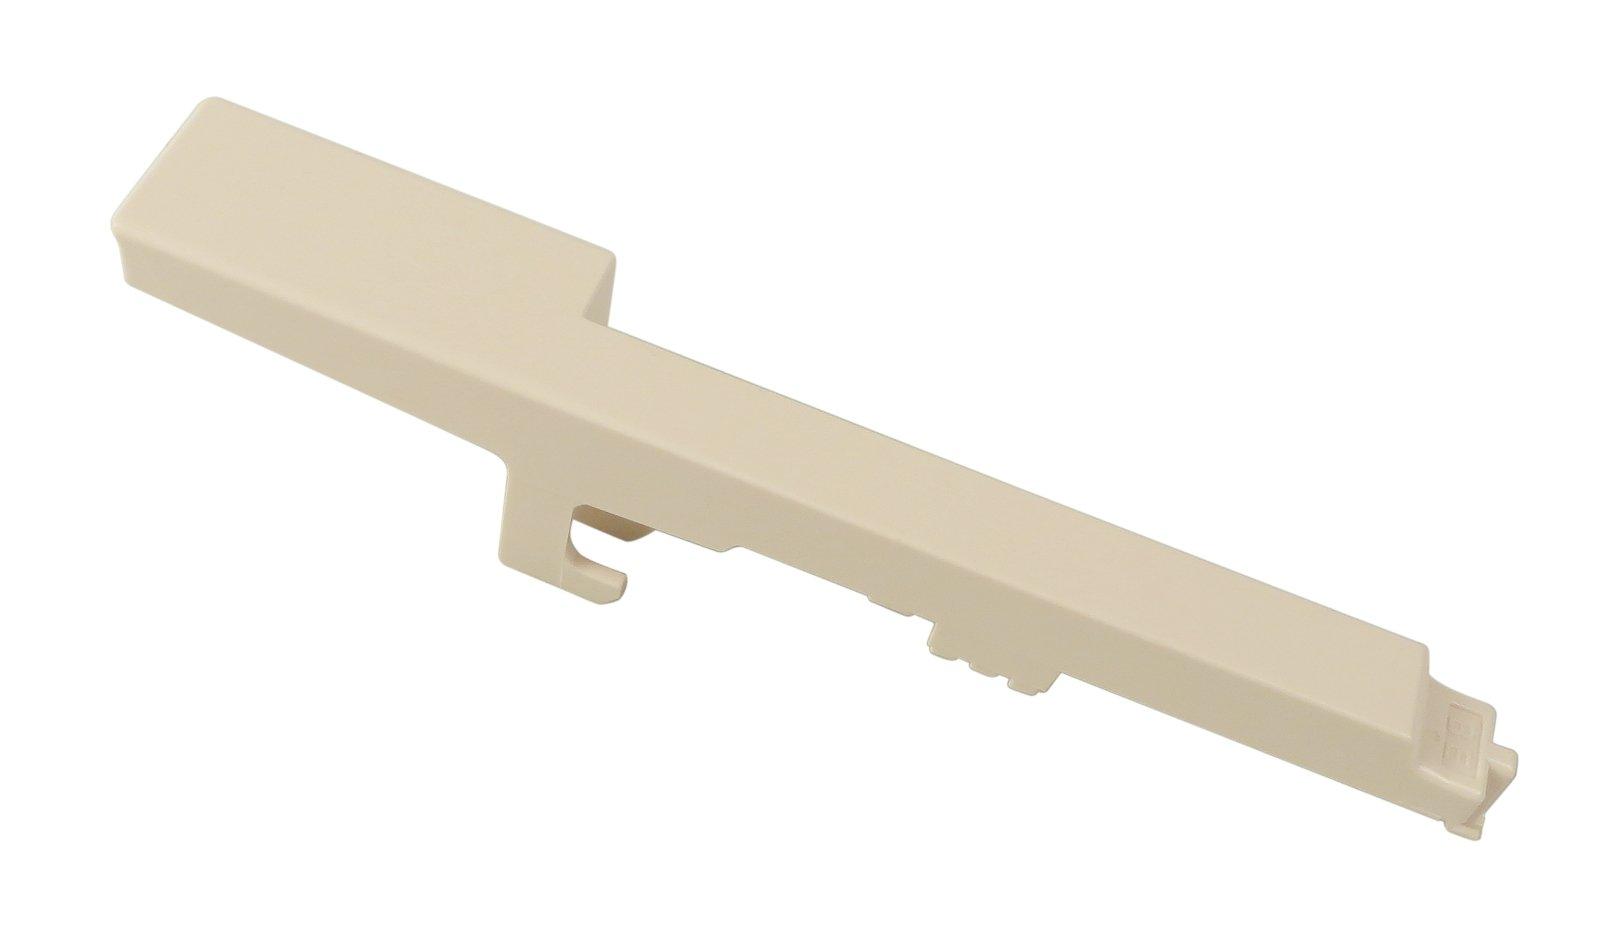 E/B White Key for MO6 and SY35